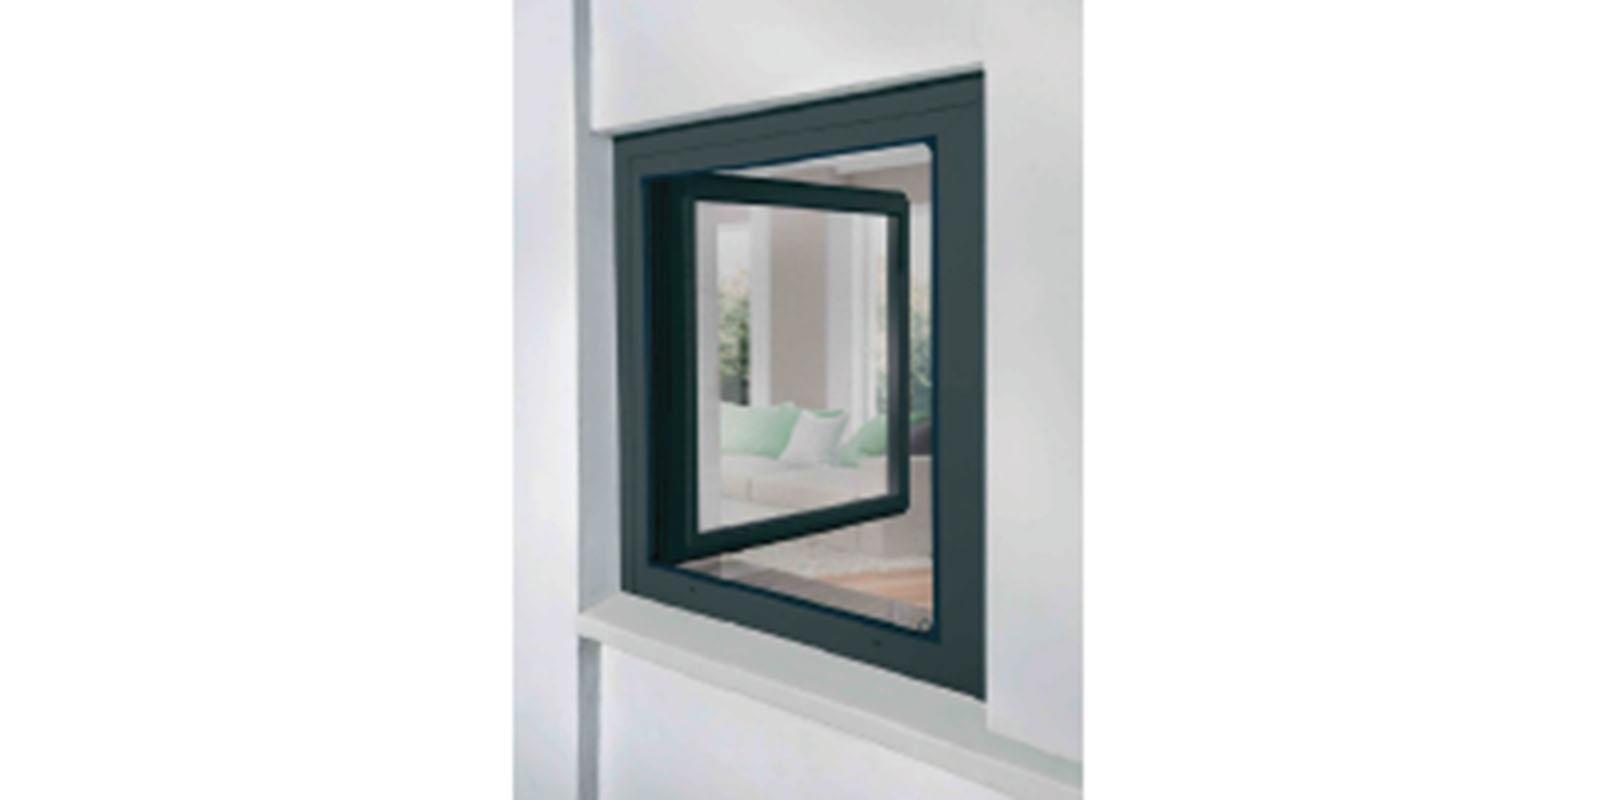 garten insektenschutz magnetisch 110x130cm fliegengitter m ckengitter fenster ebay. Black Bedroom Furniture Sets. Home Design Ideas